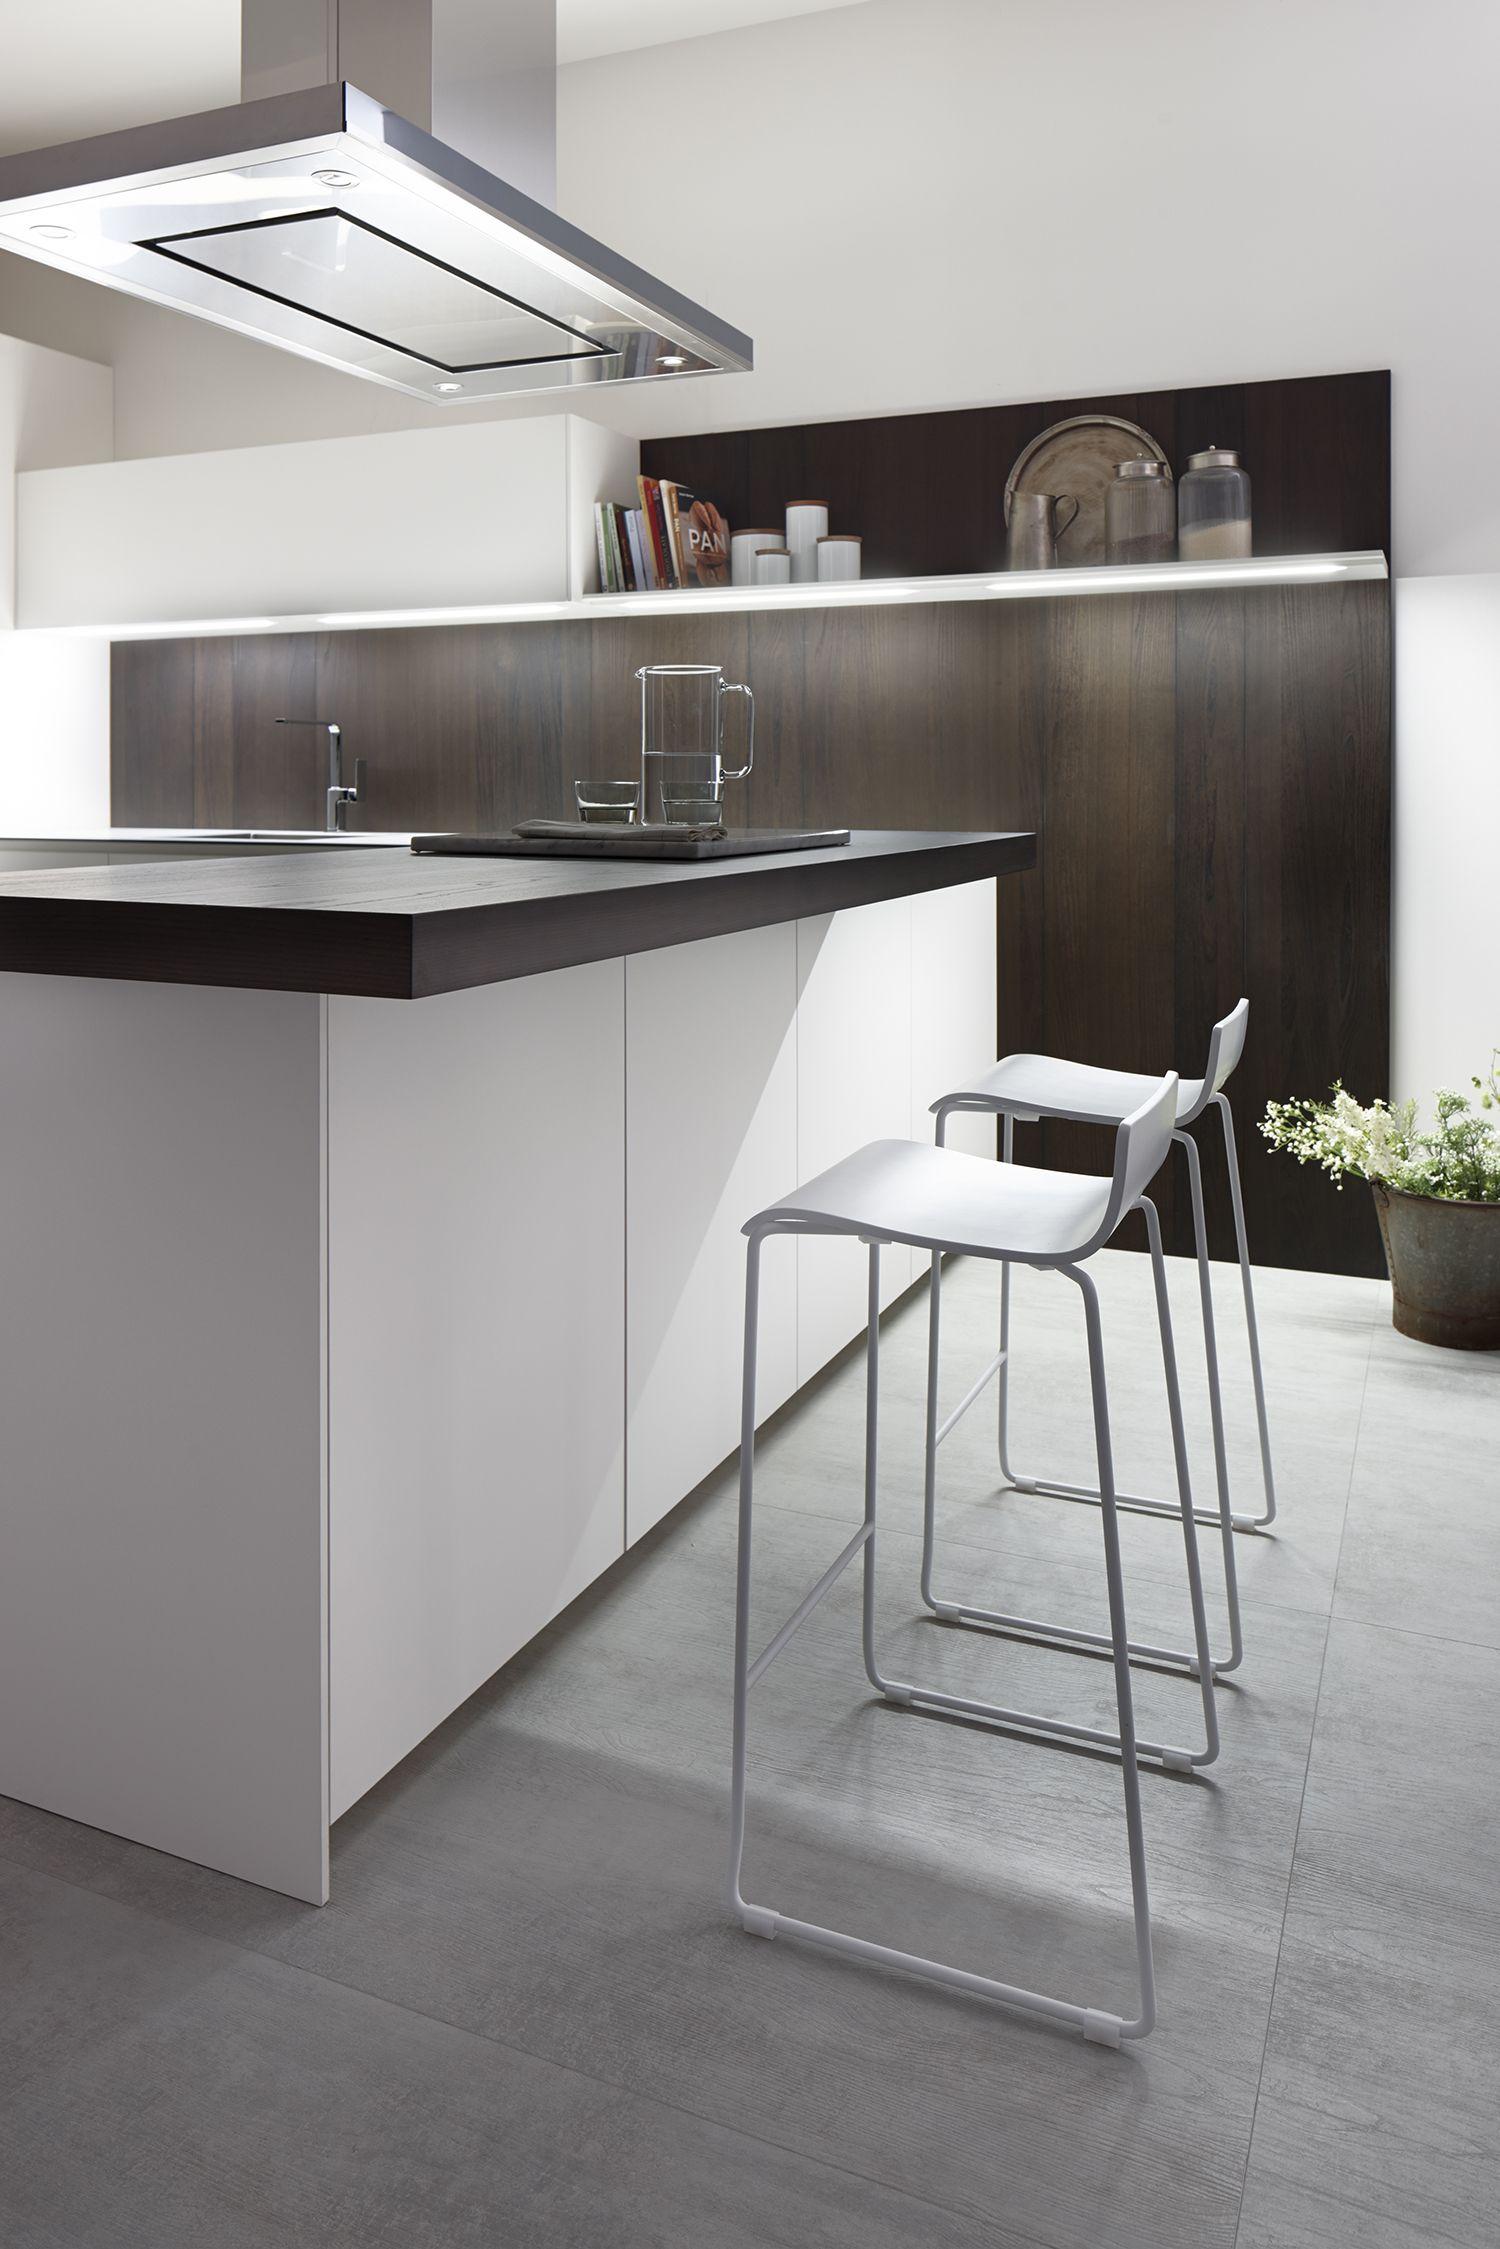 dica | Serie 45 Una cocina blanca combinada con madera oscura, con ...